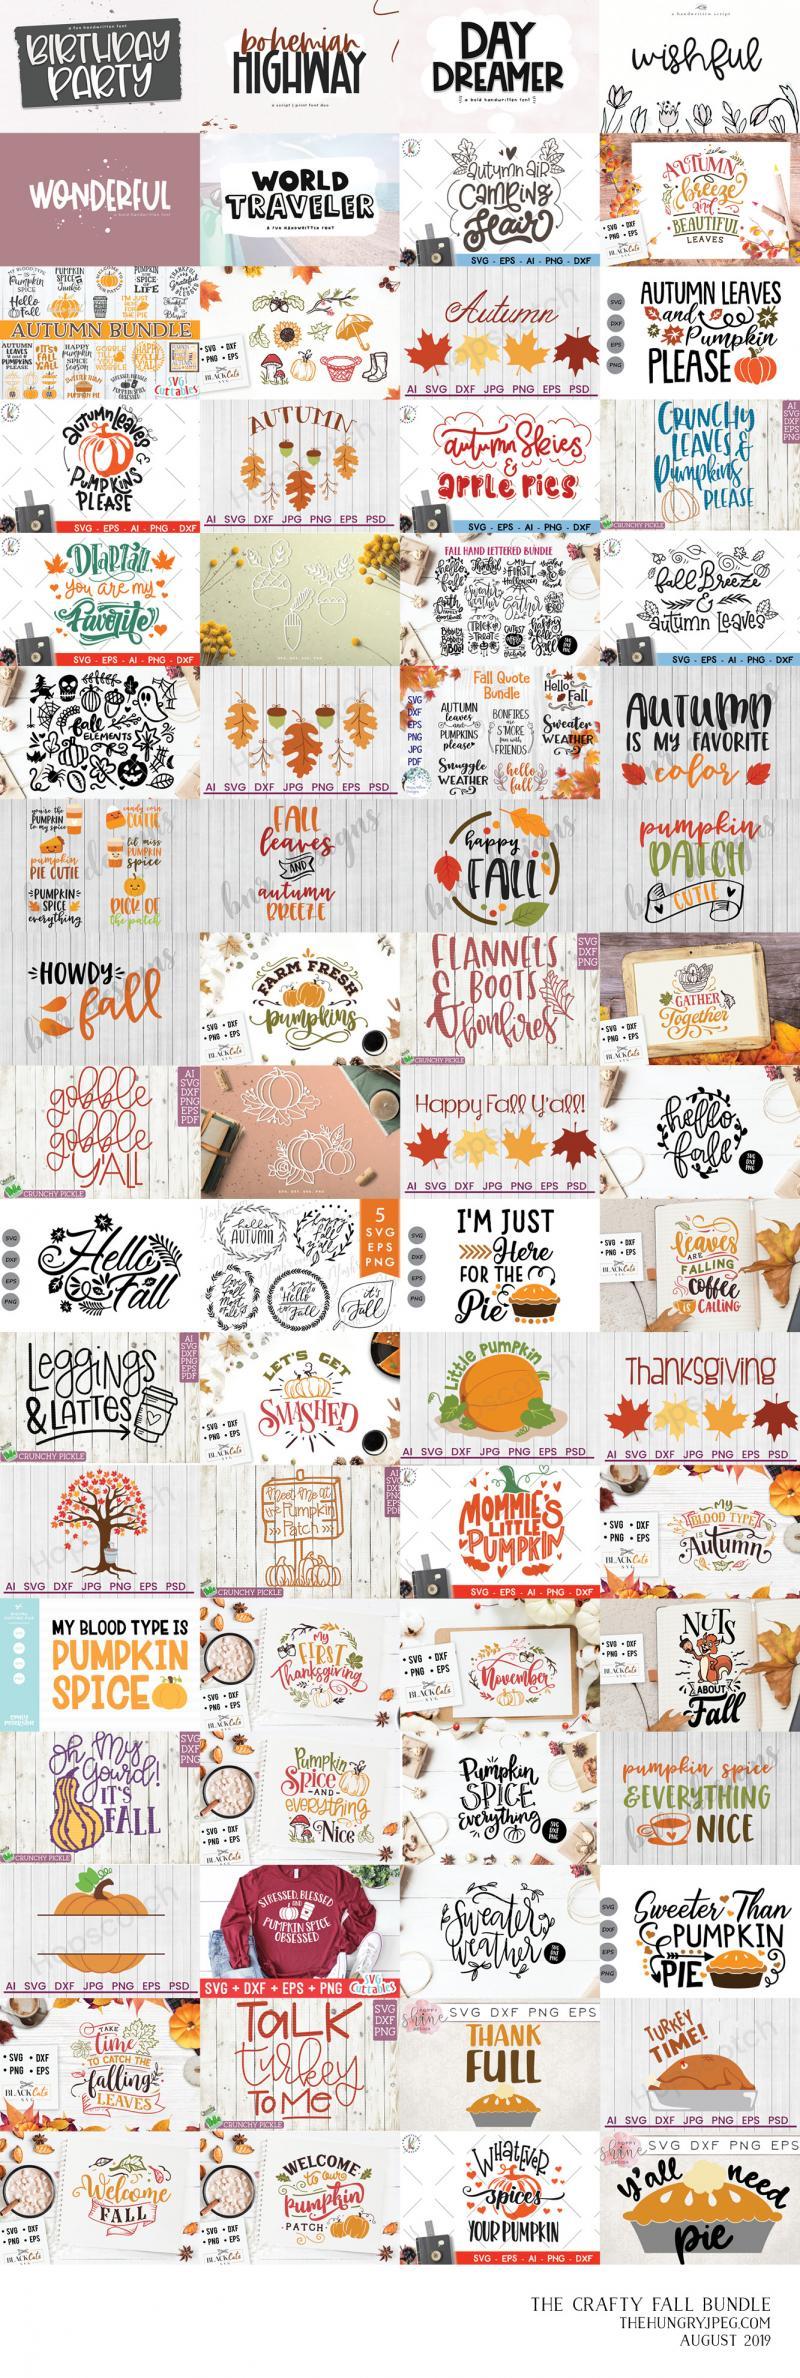 The Crafty Fall Bundle By Thehungryjpeg Thehungryjpeg Com